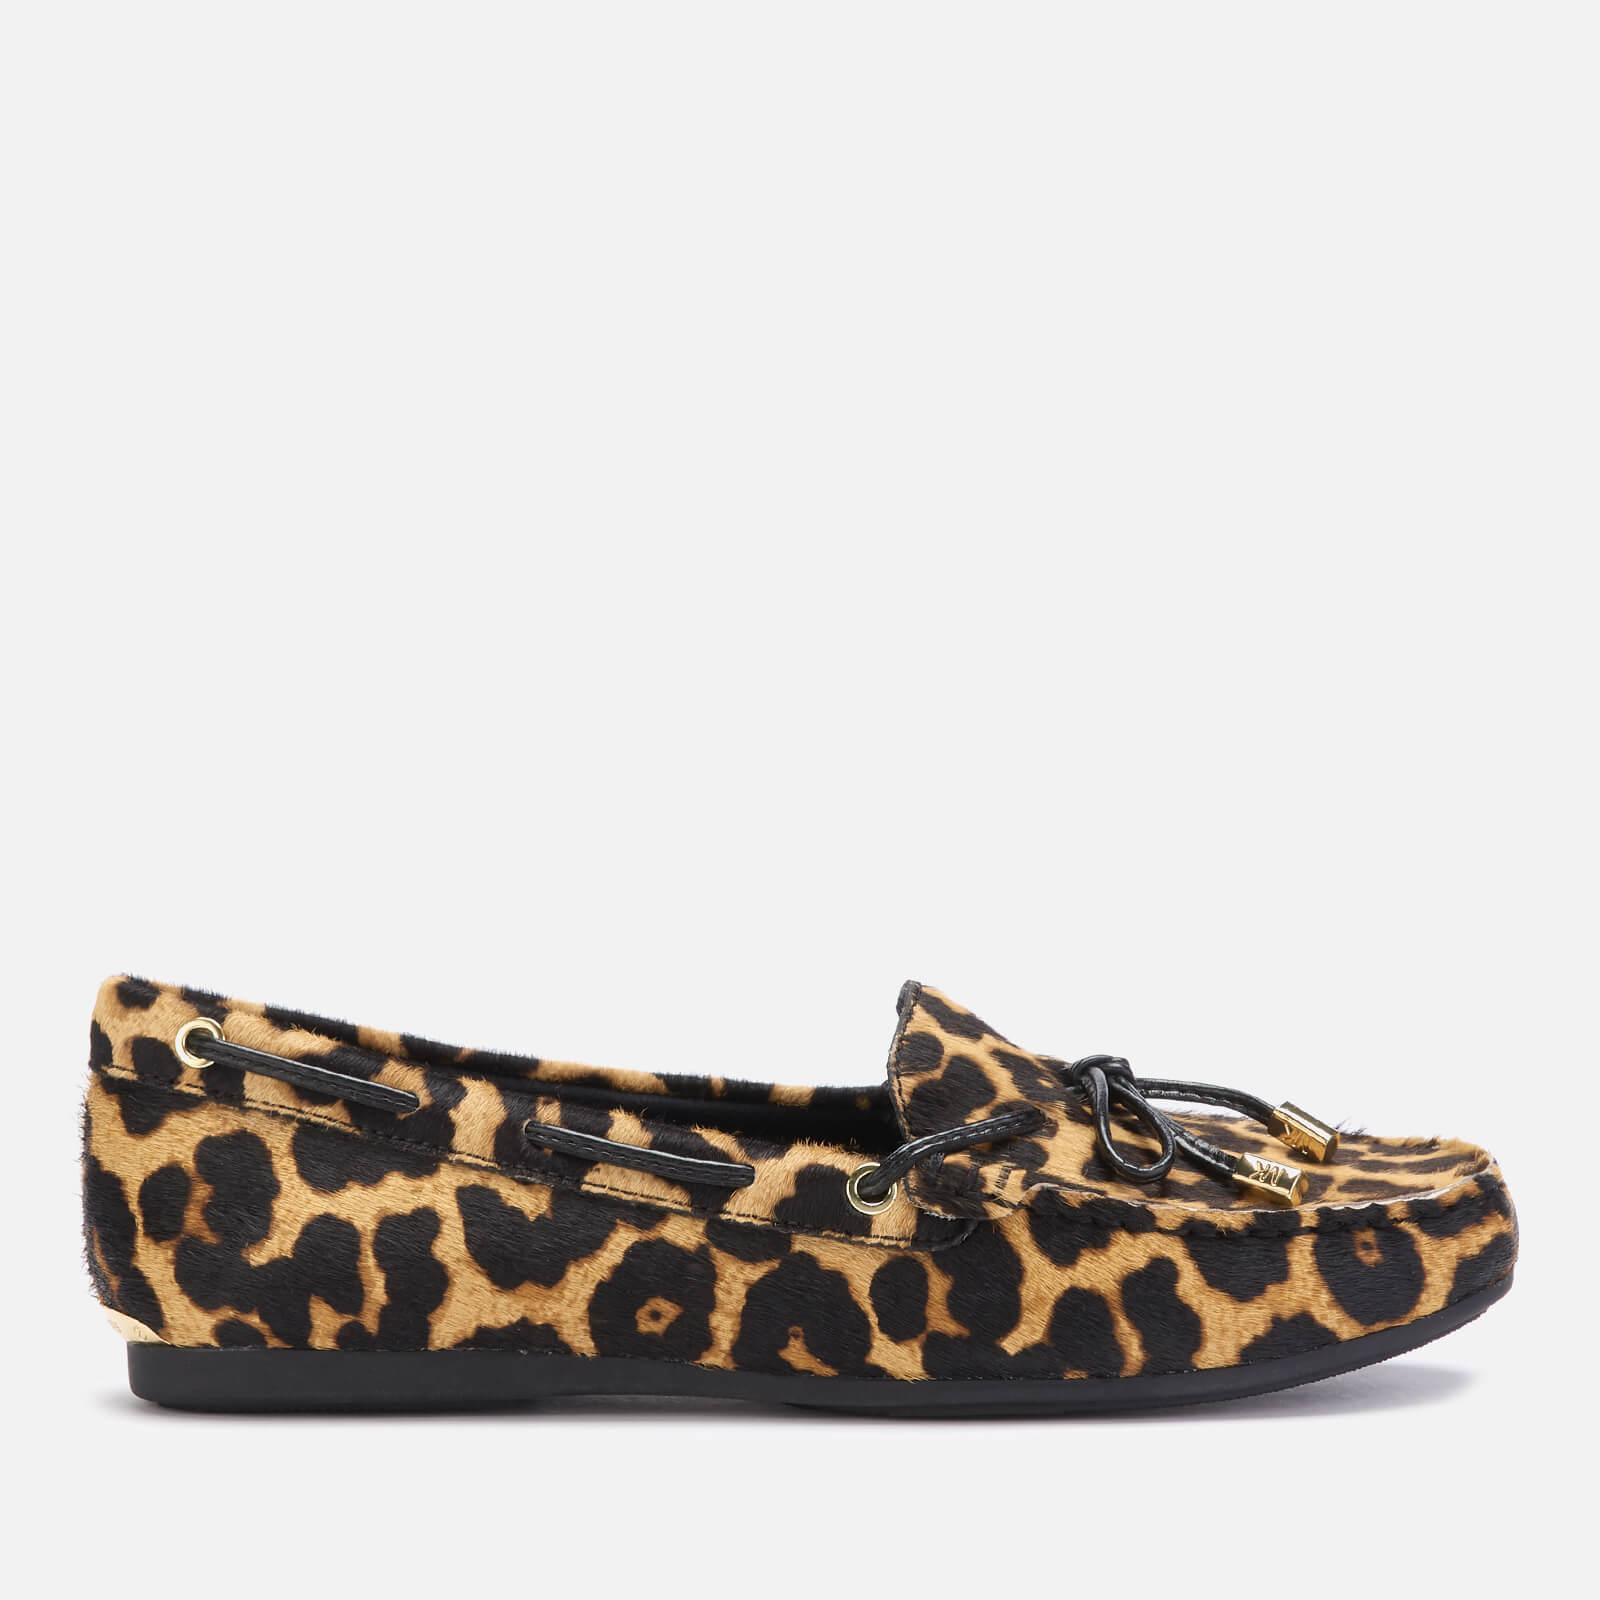 MICHAEL MICHAEL KORS Women's Sutton Leopard Moc Flats - Natural - UK 7/US 10 - Tan